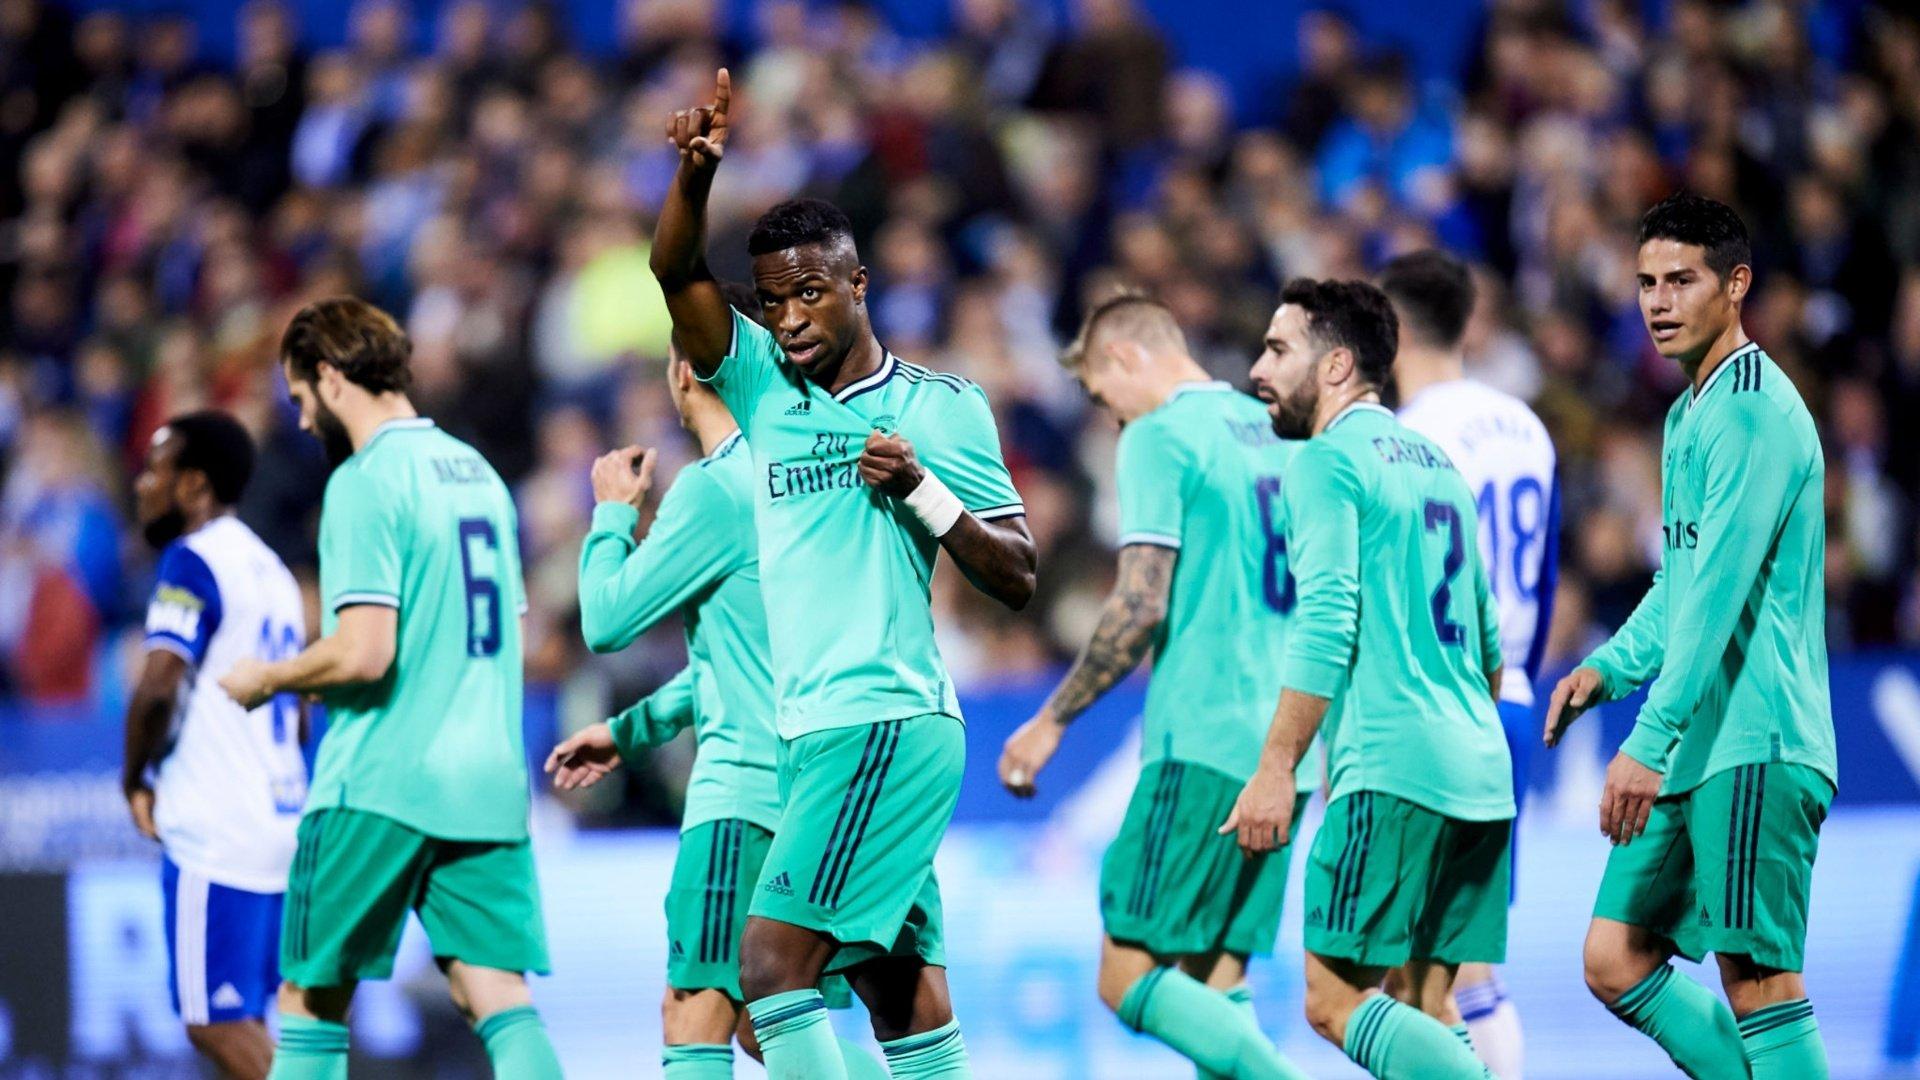 Vinicius Jr, Lucas and Carvajal react to Copa del Rey win